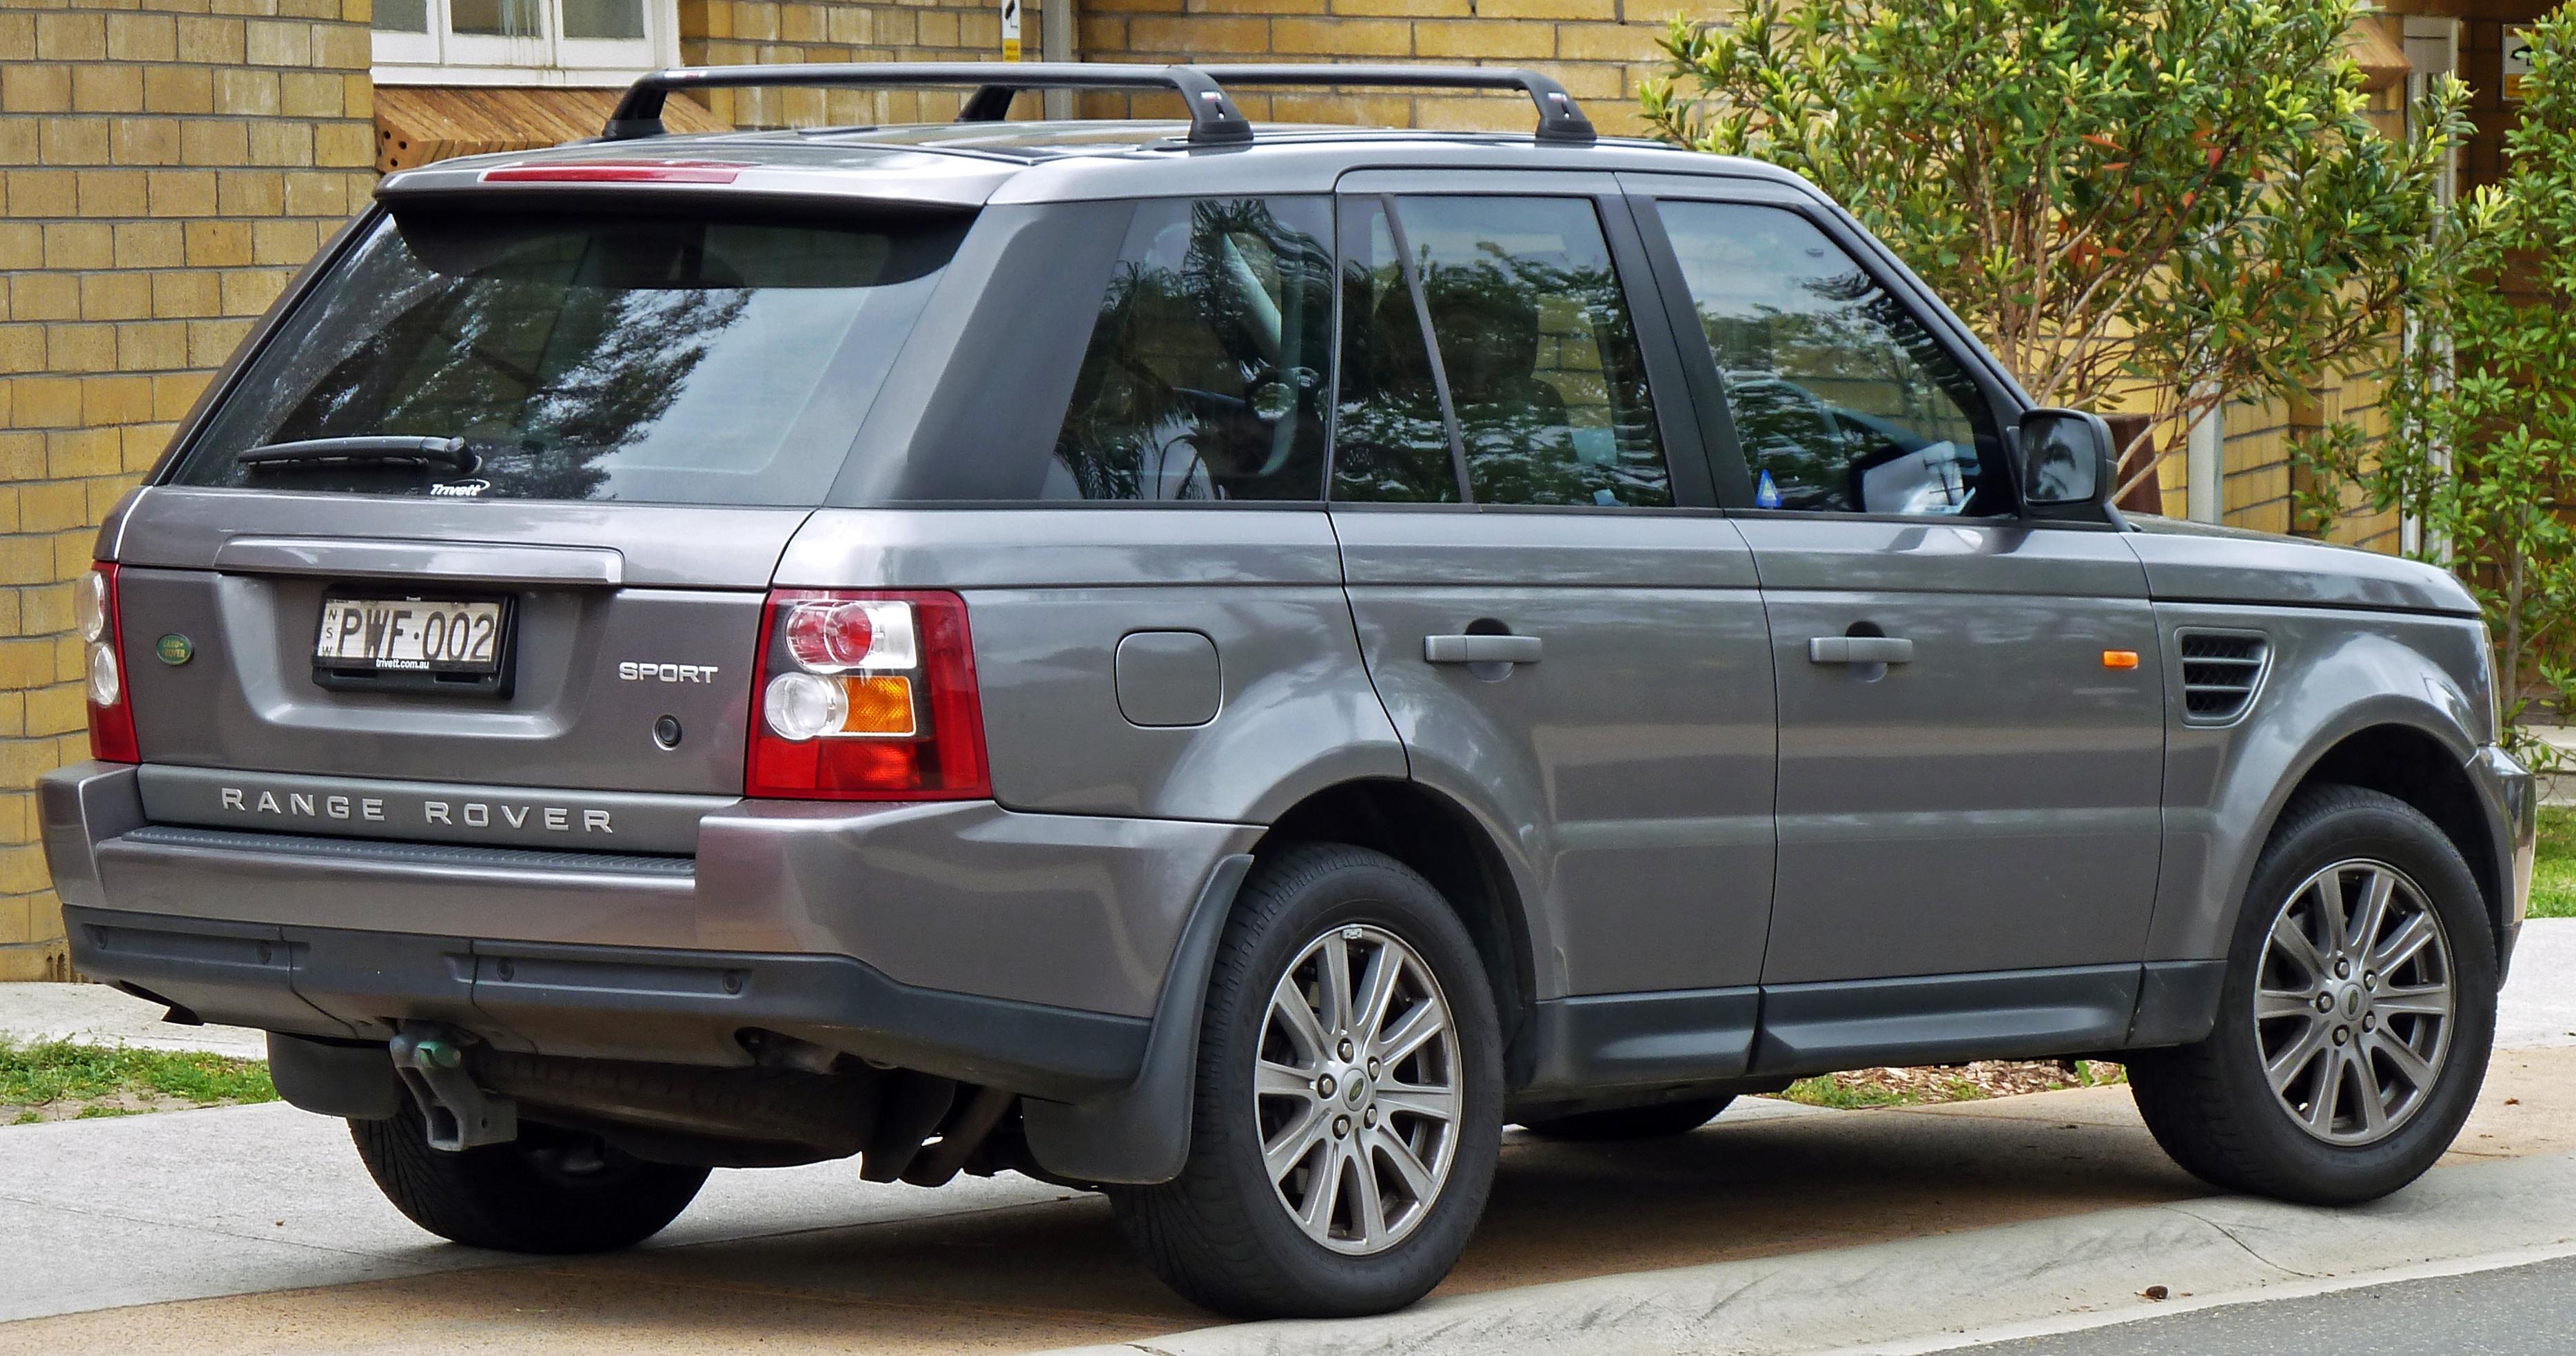 File:2005-2008 Land Rover Range Rover Sport wagon 03.jpg - Wikimedia